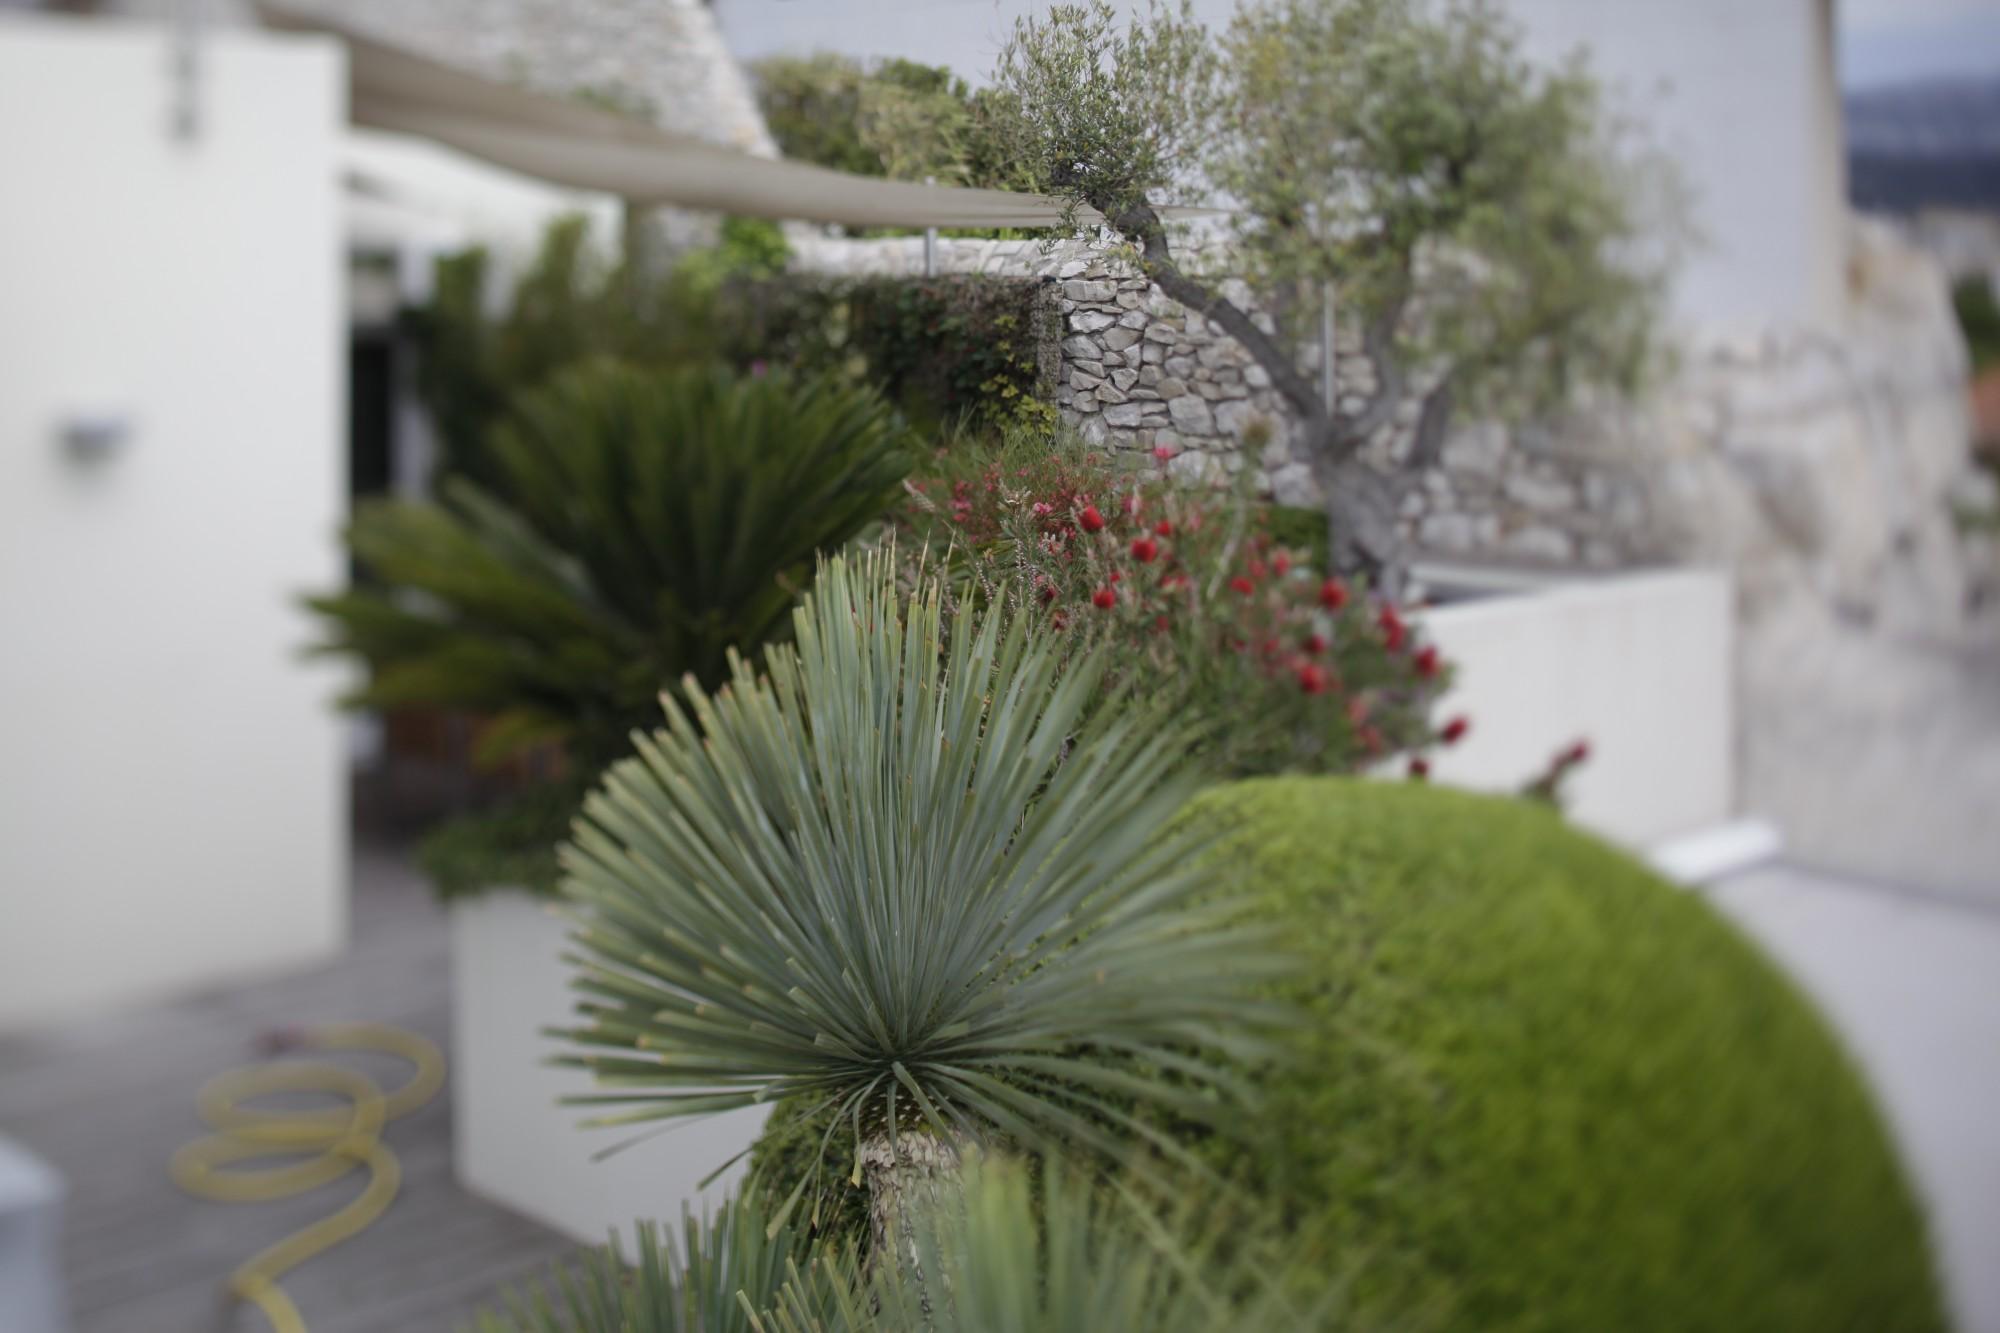 Am nagement jardins entretien espaces verts marseille for Entretien jardin 47